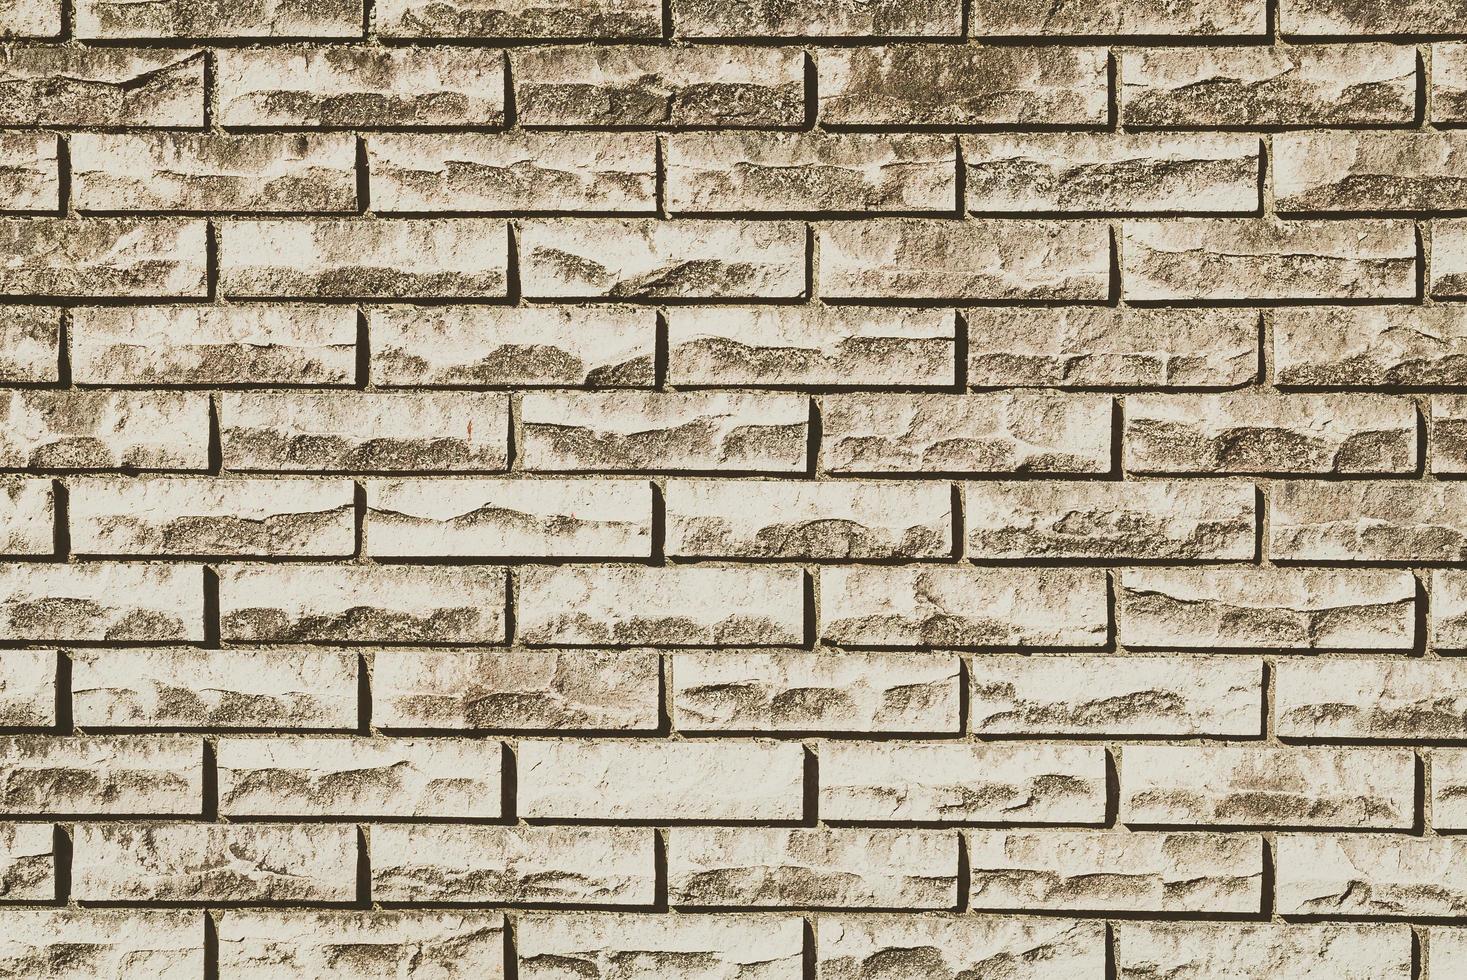 Backsteinmauer Texturen foto